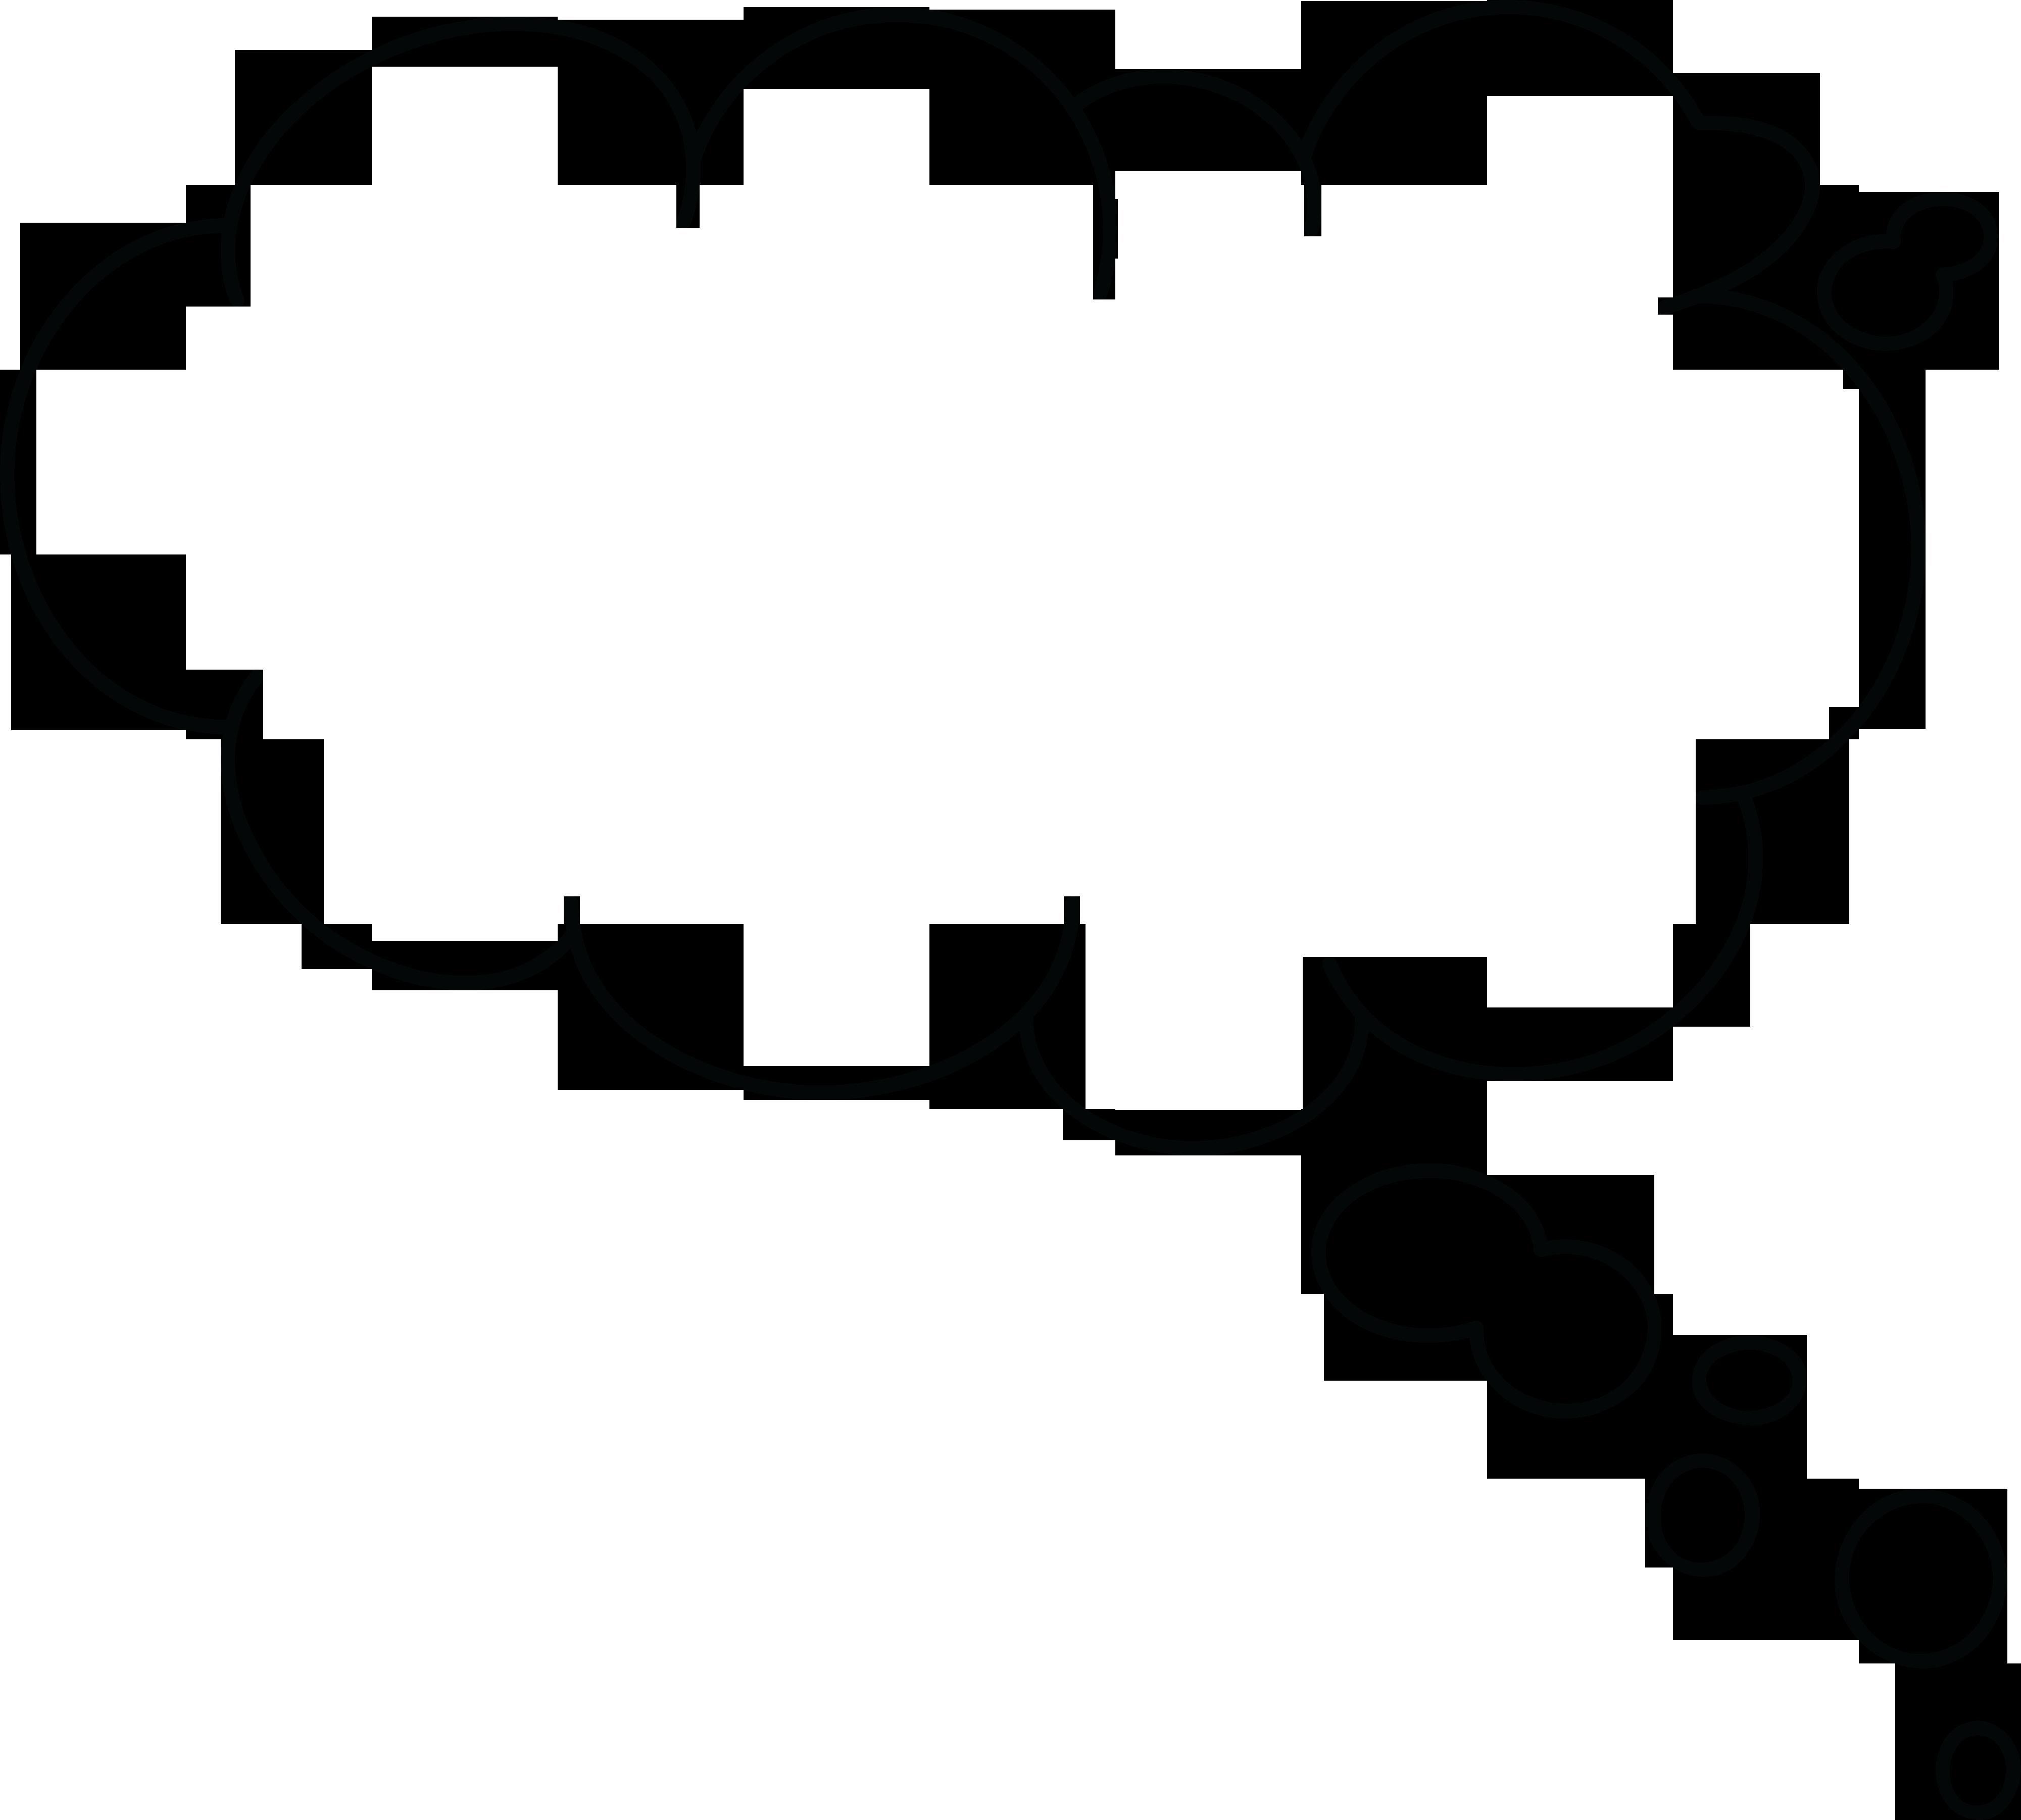 Cloud Outline Clipart   Free download best Cloud Outline